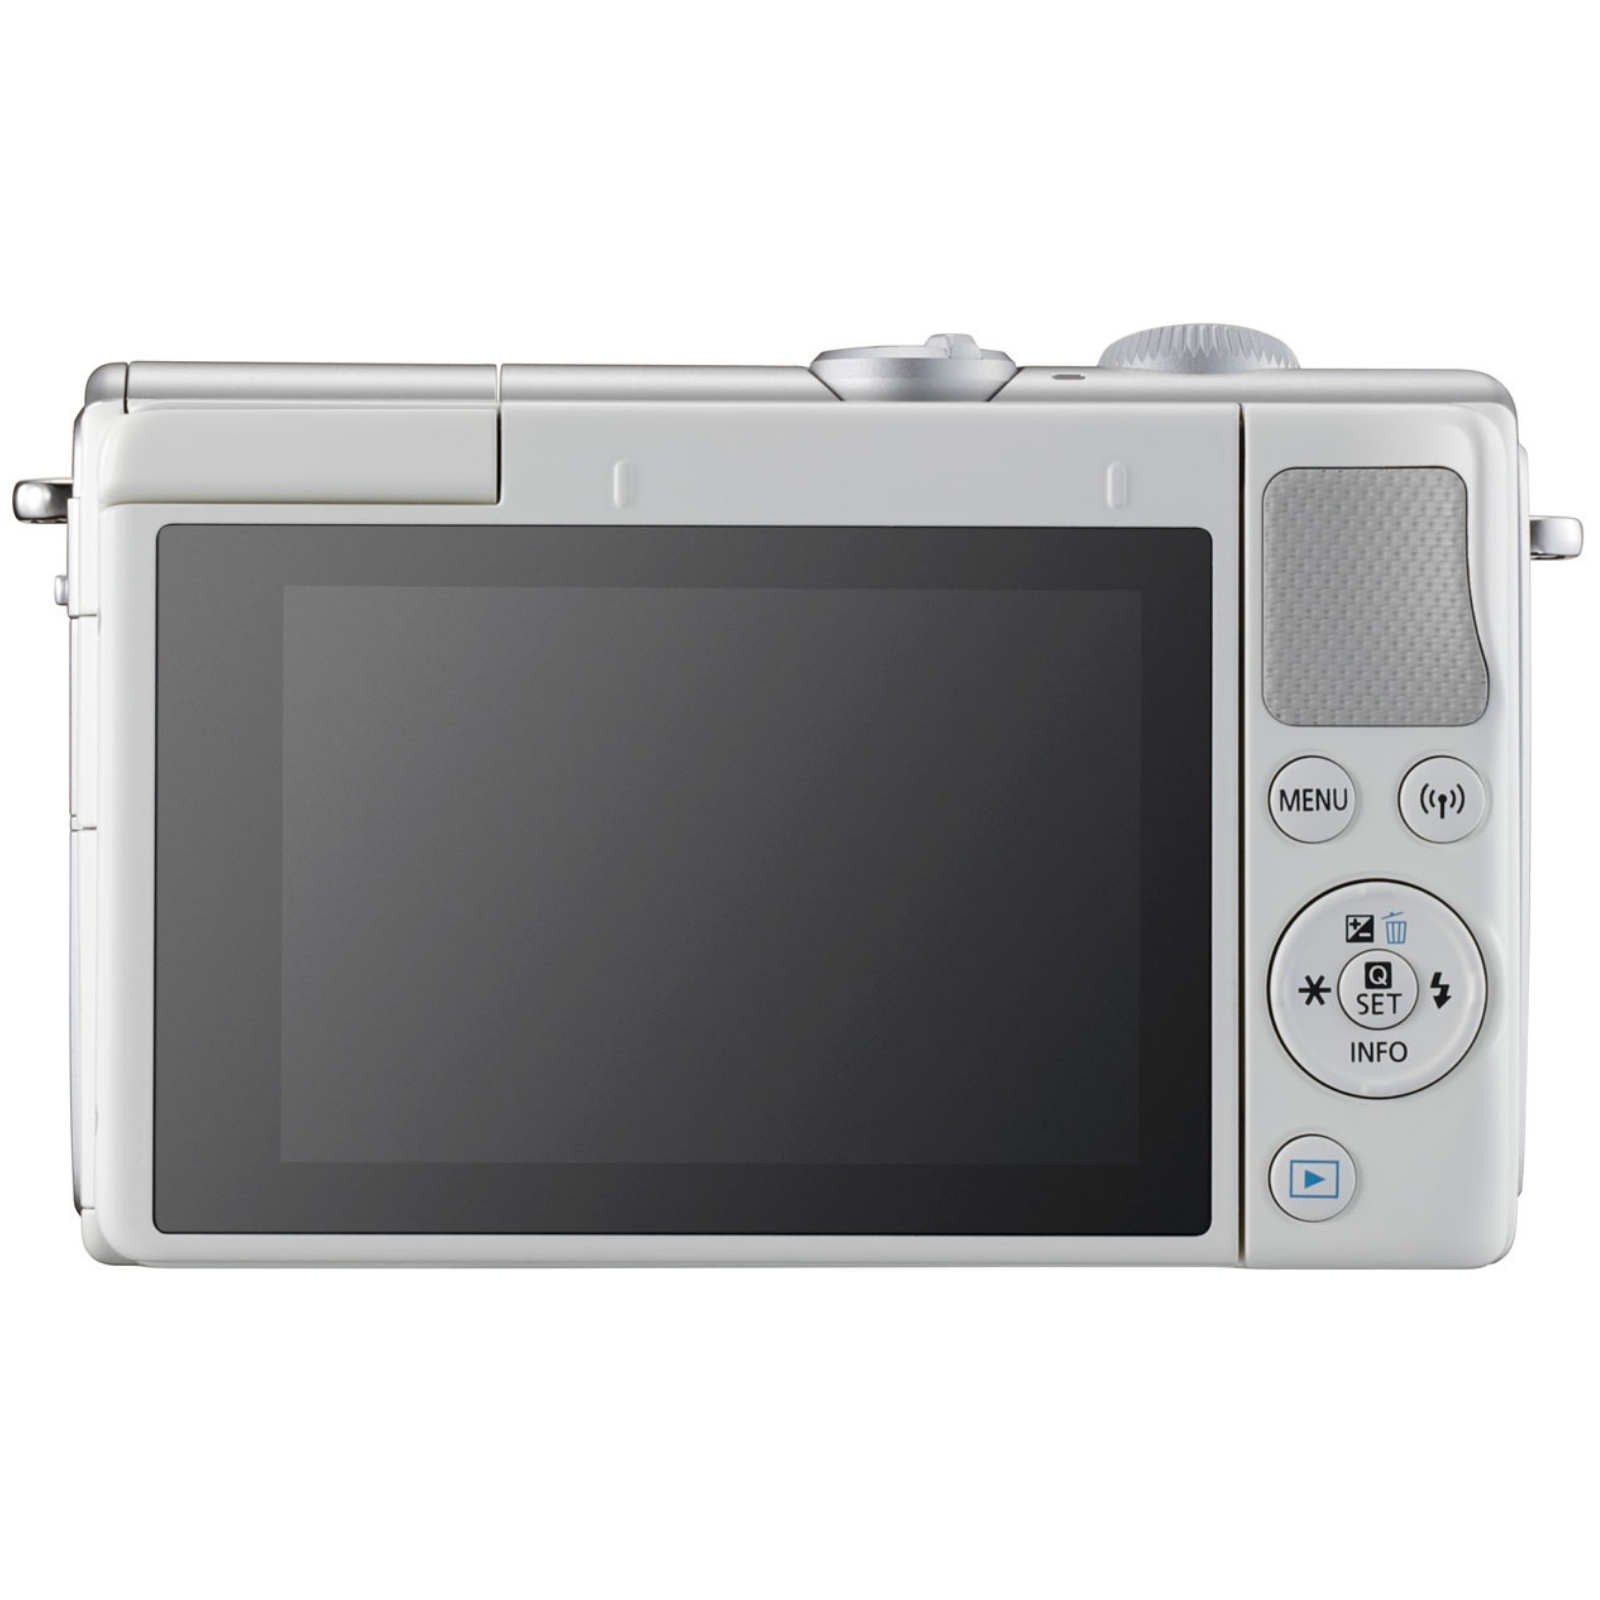 Canon キヤノン ミラーレス一眼カメラ EOS M100 ボディ ホワイト 新品